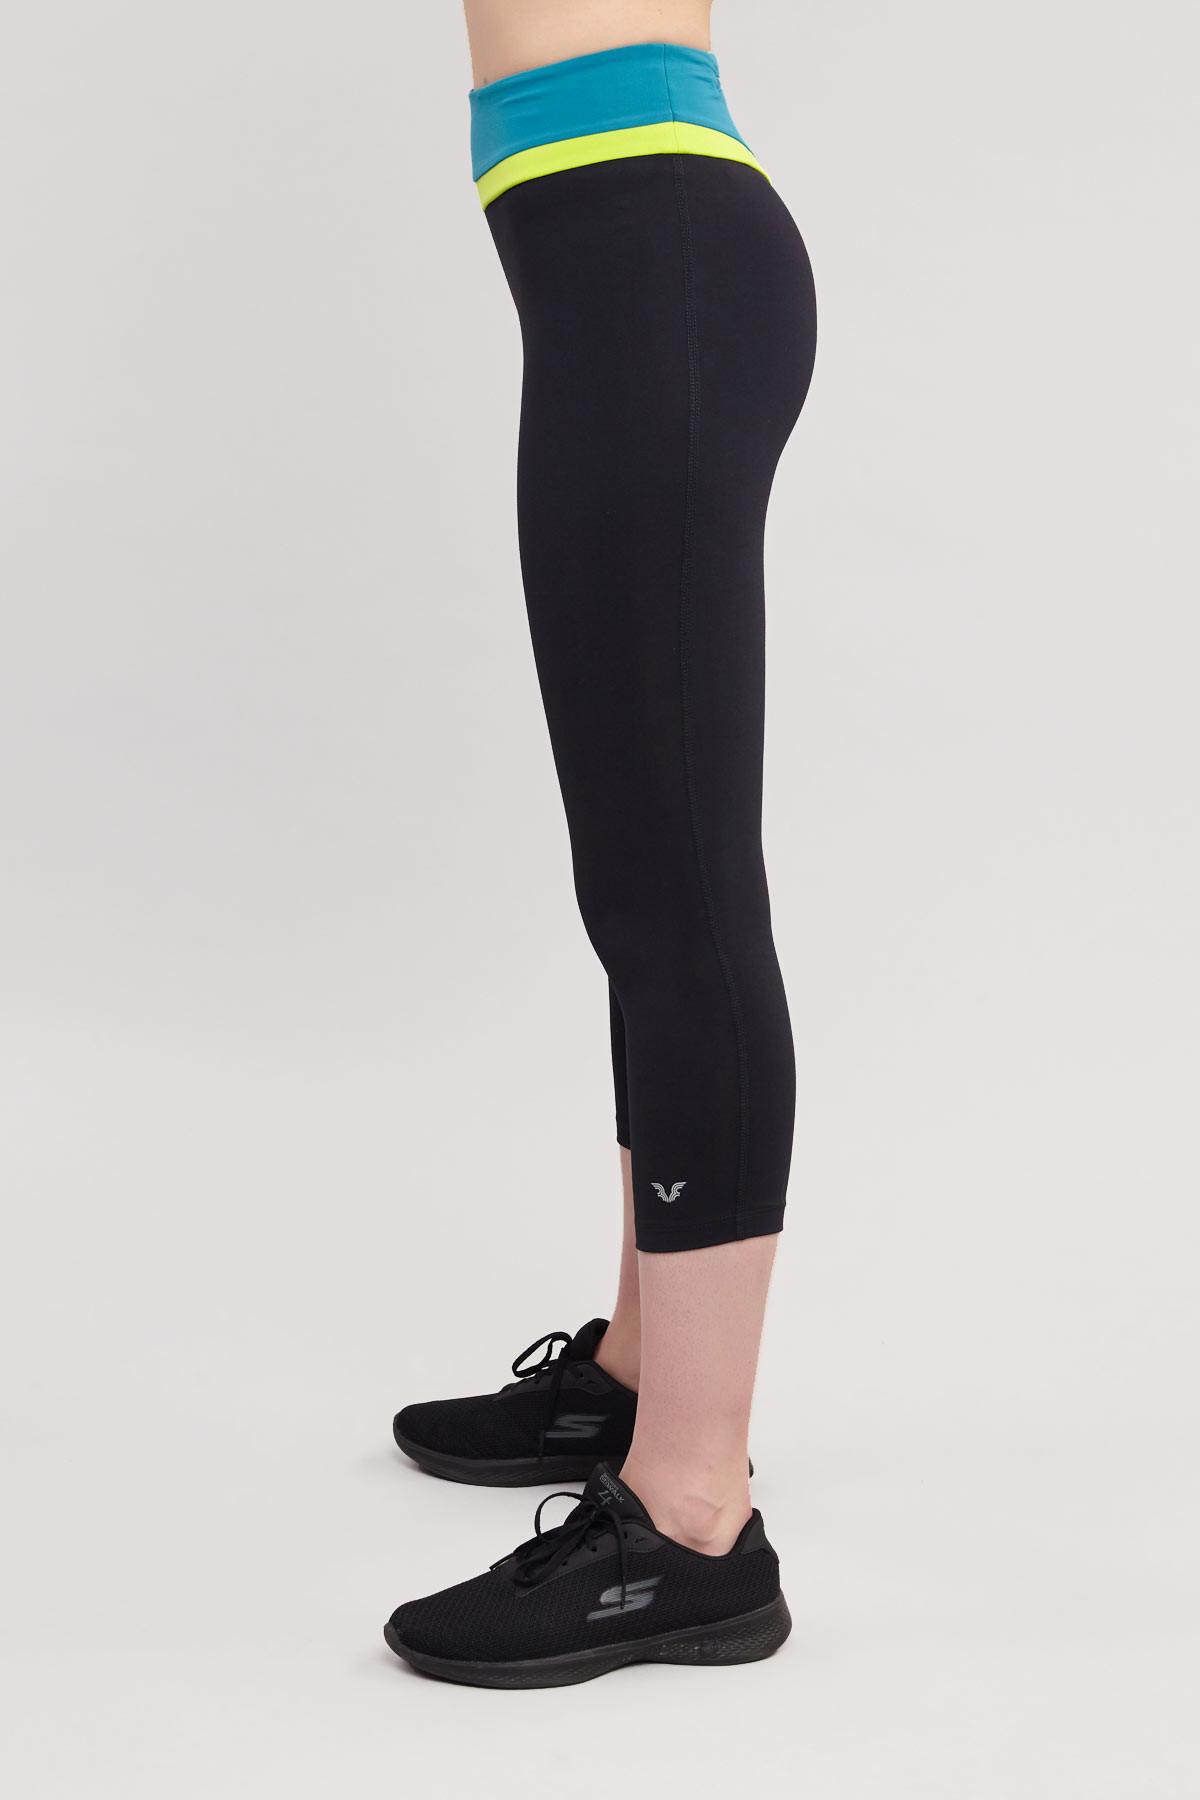 Bilcee 3/4 Kısa Sporcu Kadın Taytı BS-7118 BİLCEE